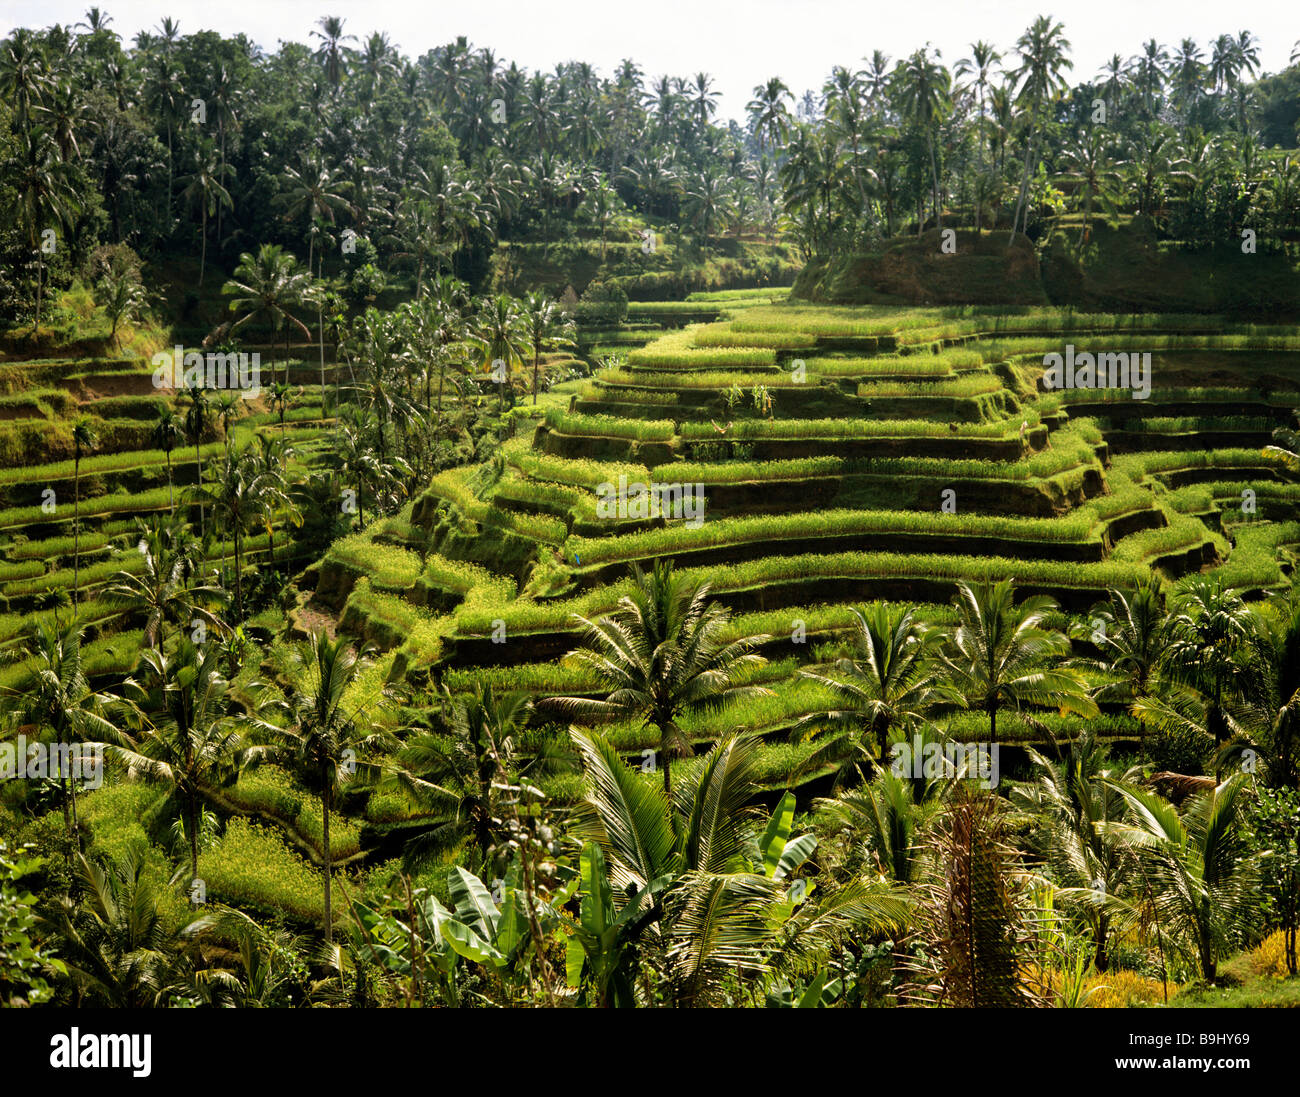 Rice paddies near Ubud, Bali, Indonesia, south-east Asia Stock Photo